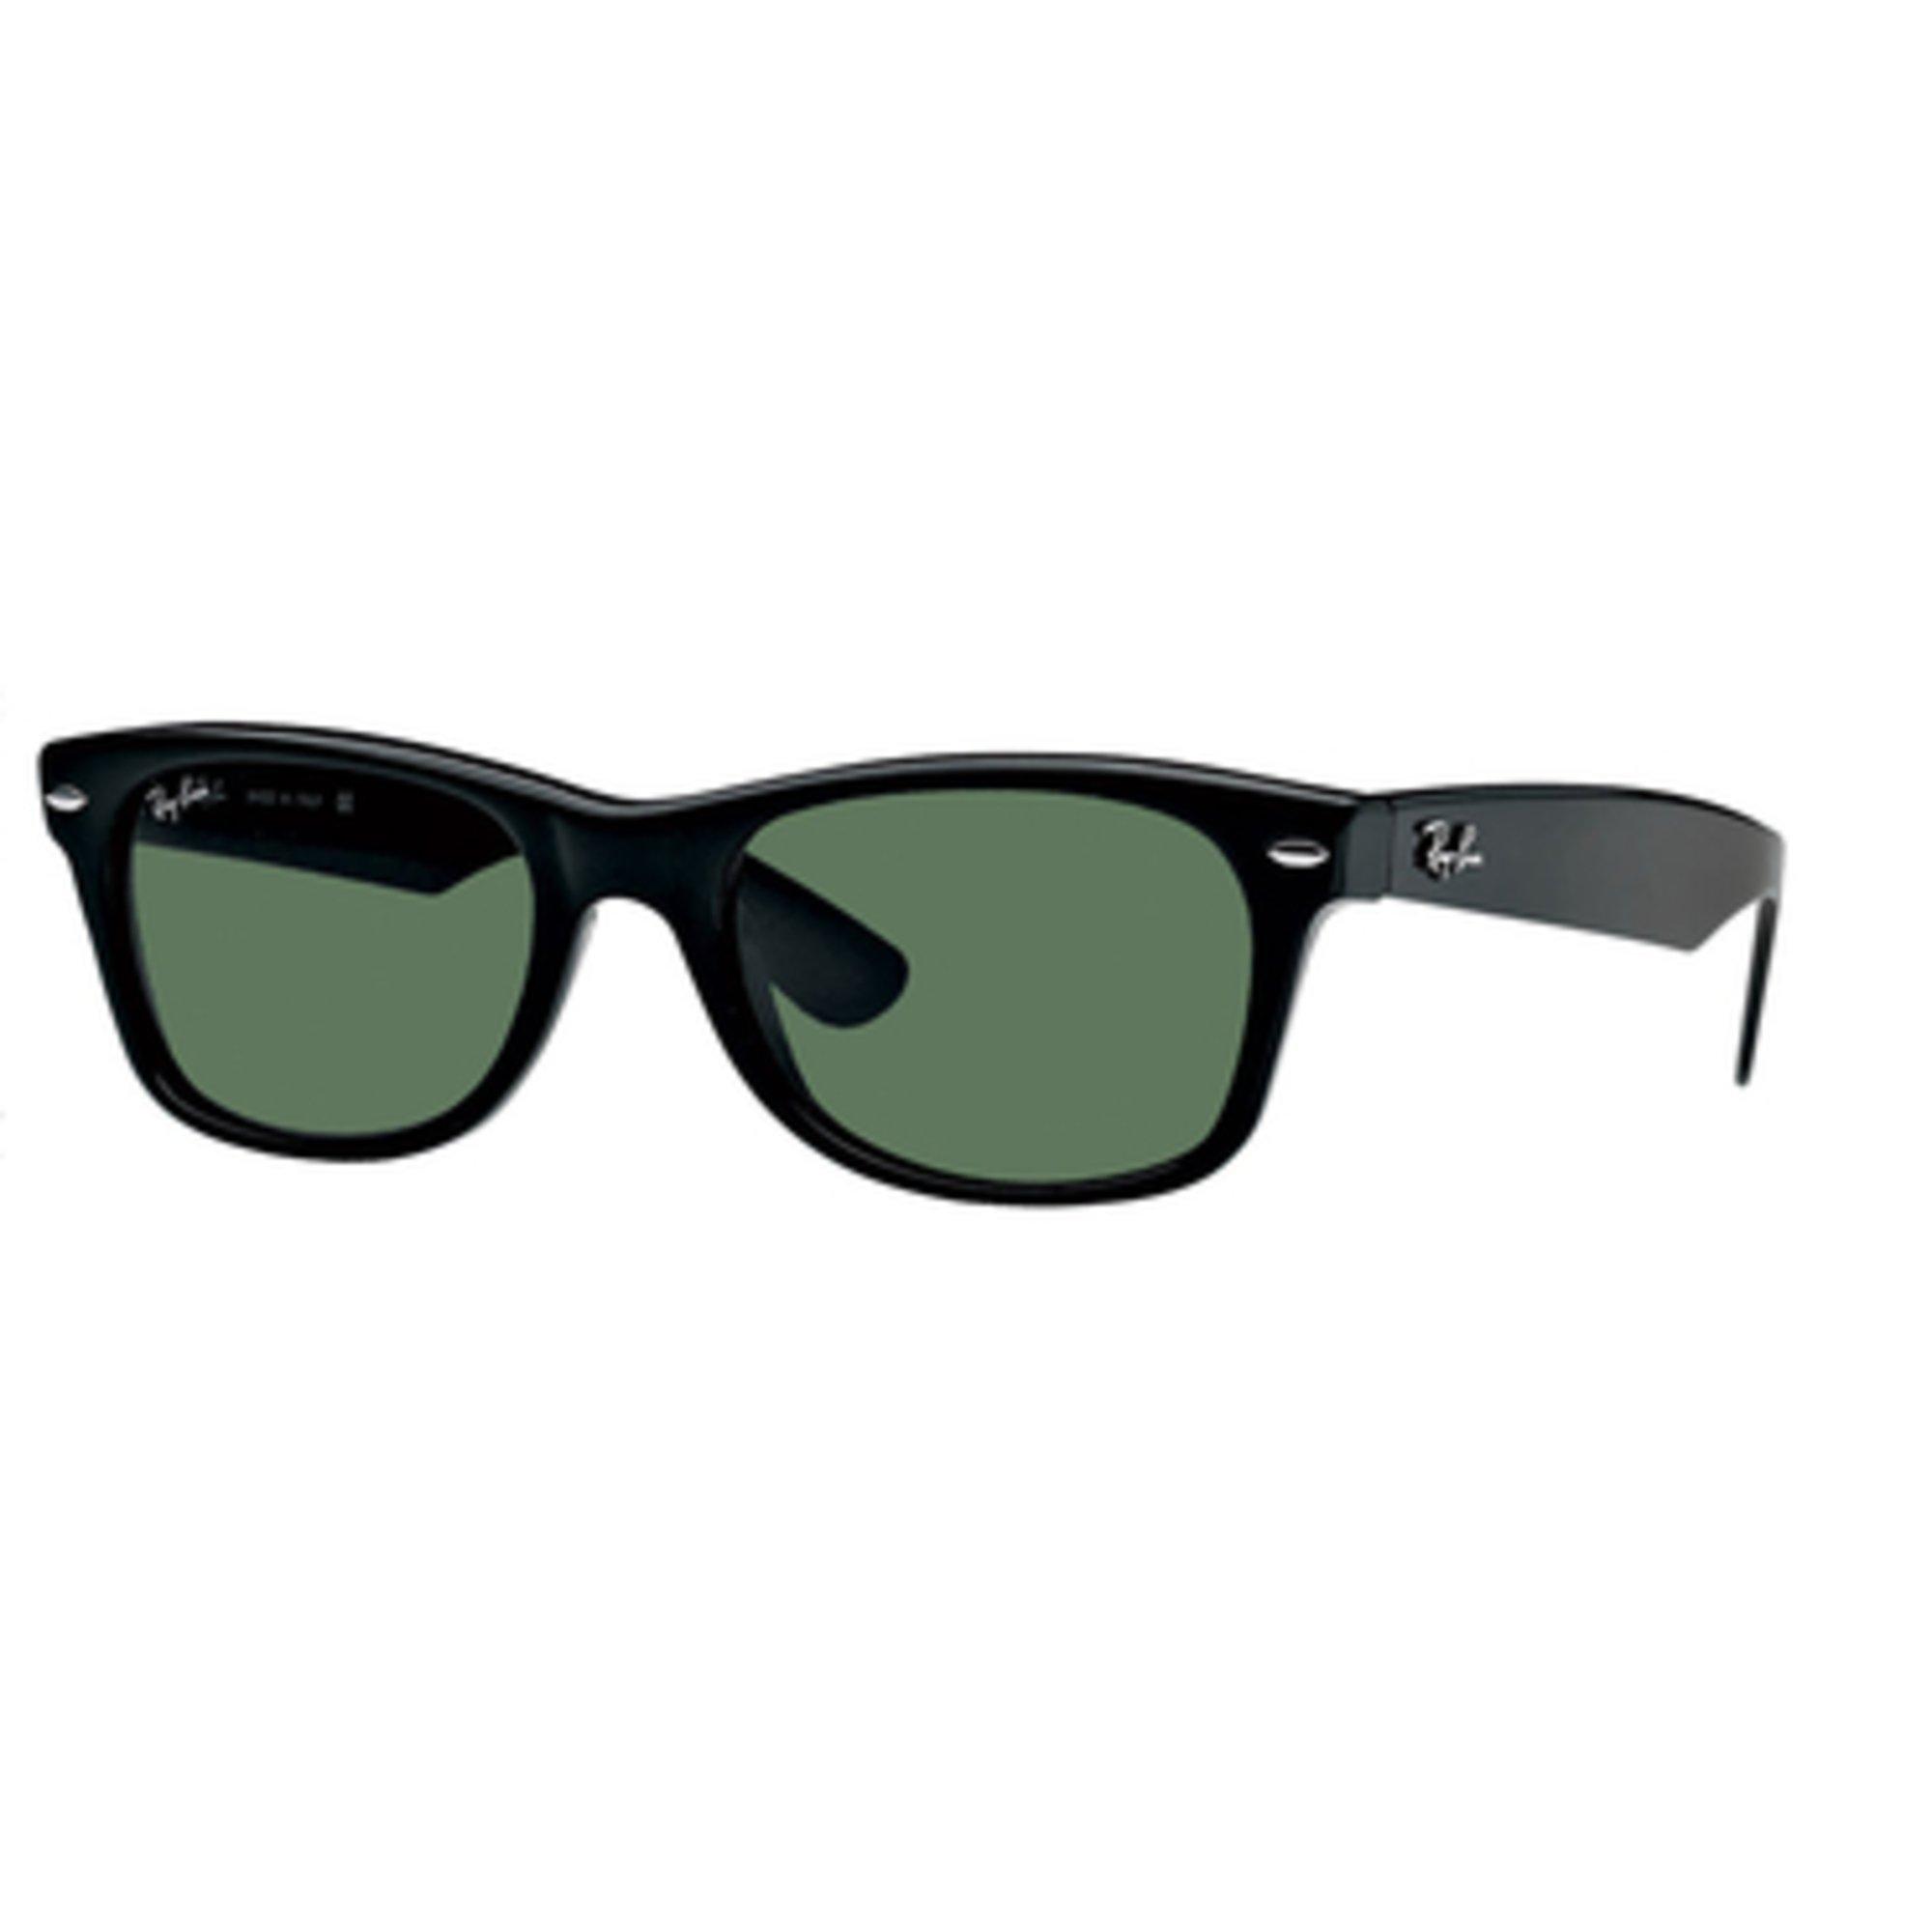 a1e2d827bf8 Ray-Ban. Ray-Ban Unisex Wayfarer Classic Polarized Sunglasses Black Green  ...